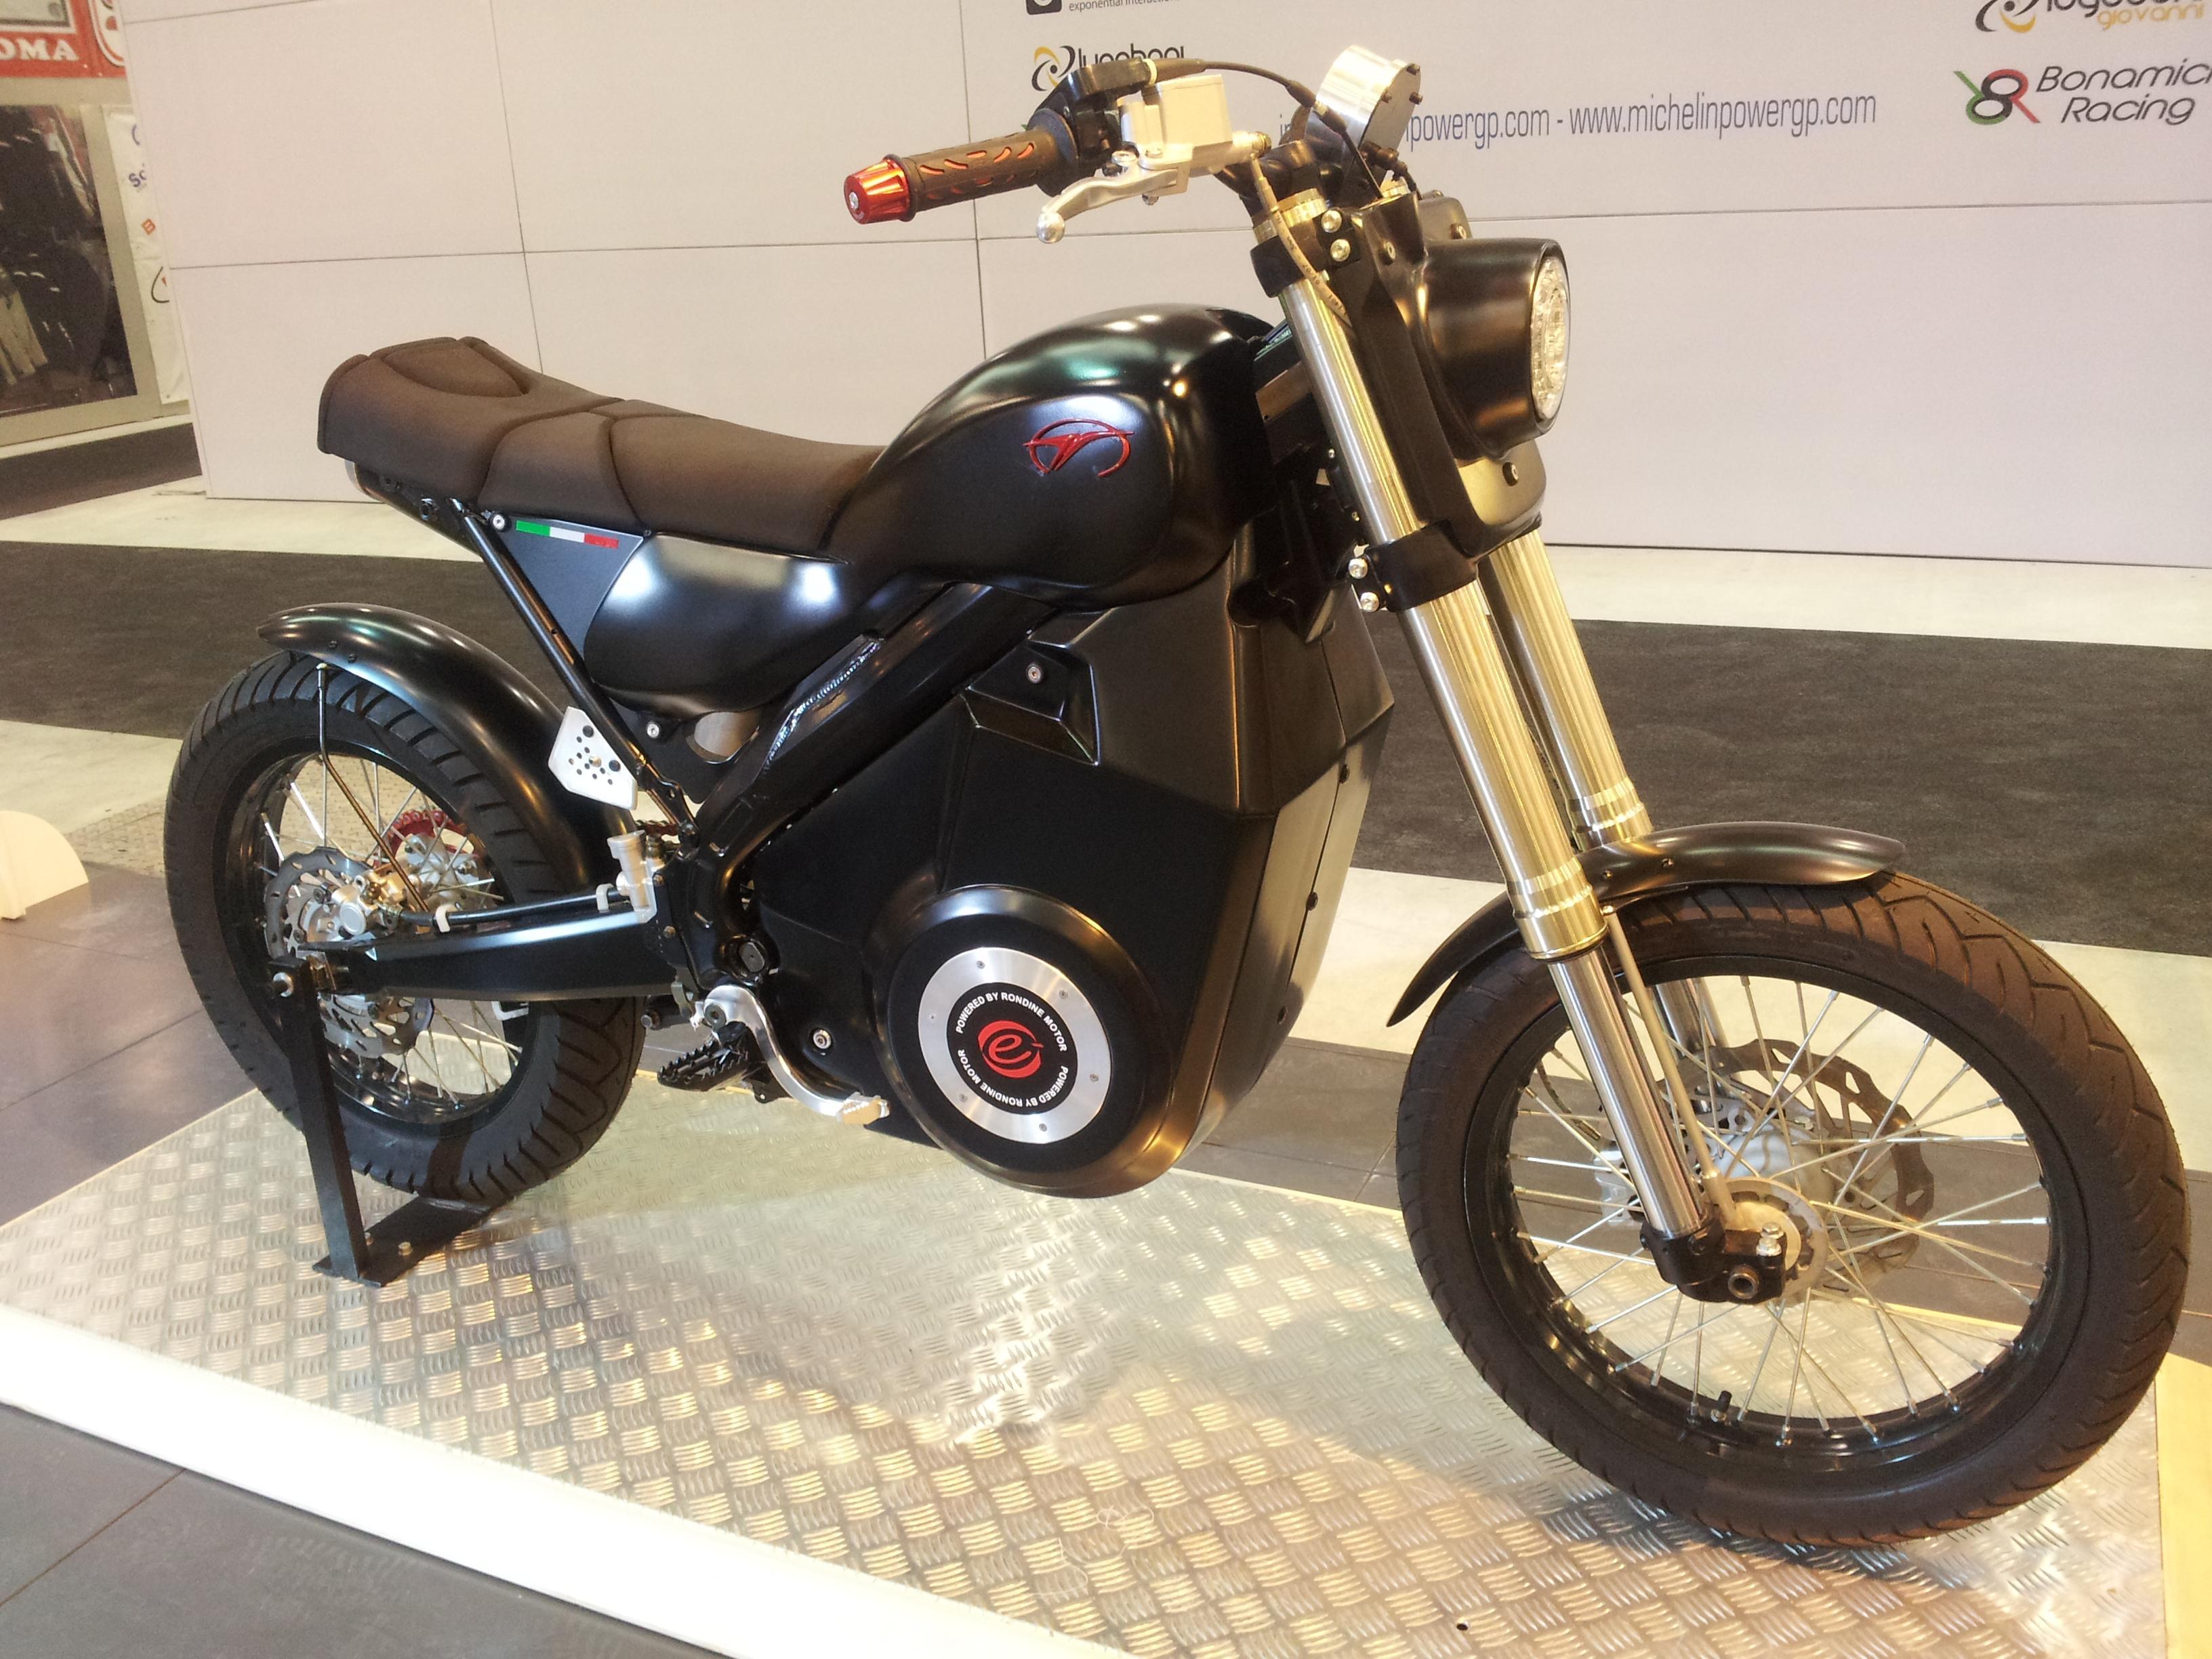 Rondine Motor electric motorcycles